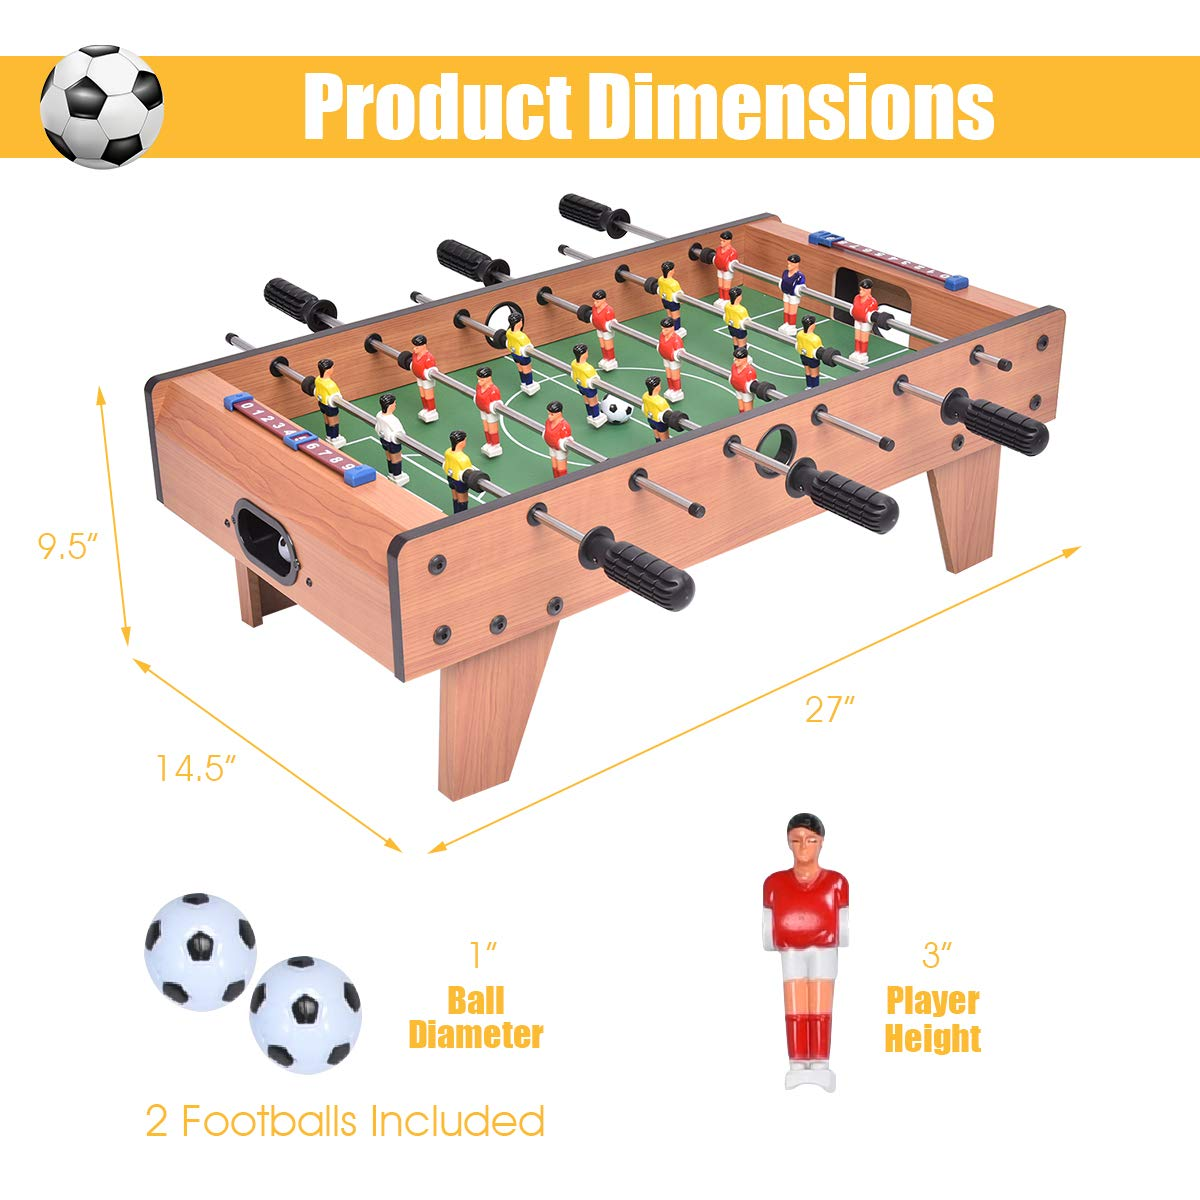 7. The Giantex 27-inch Foosball Table